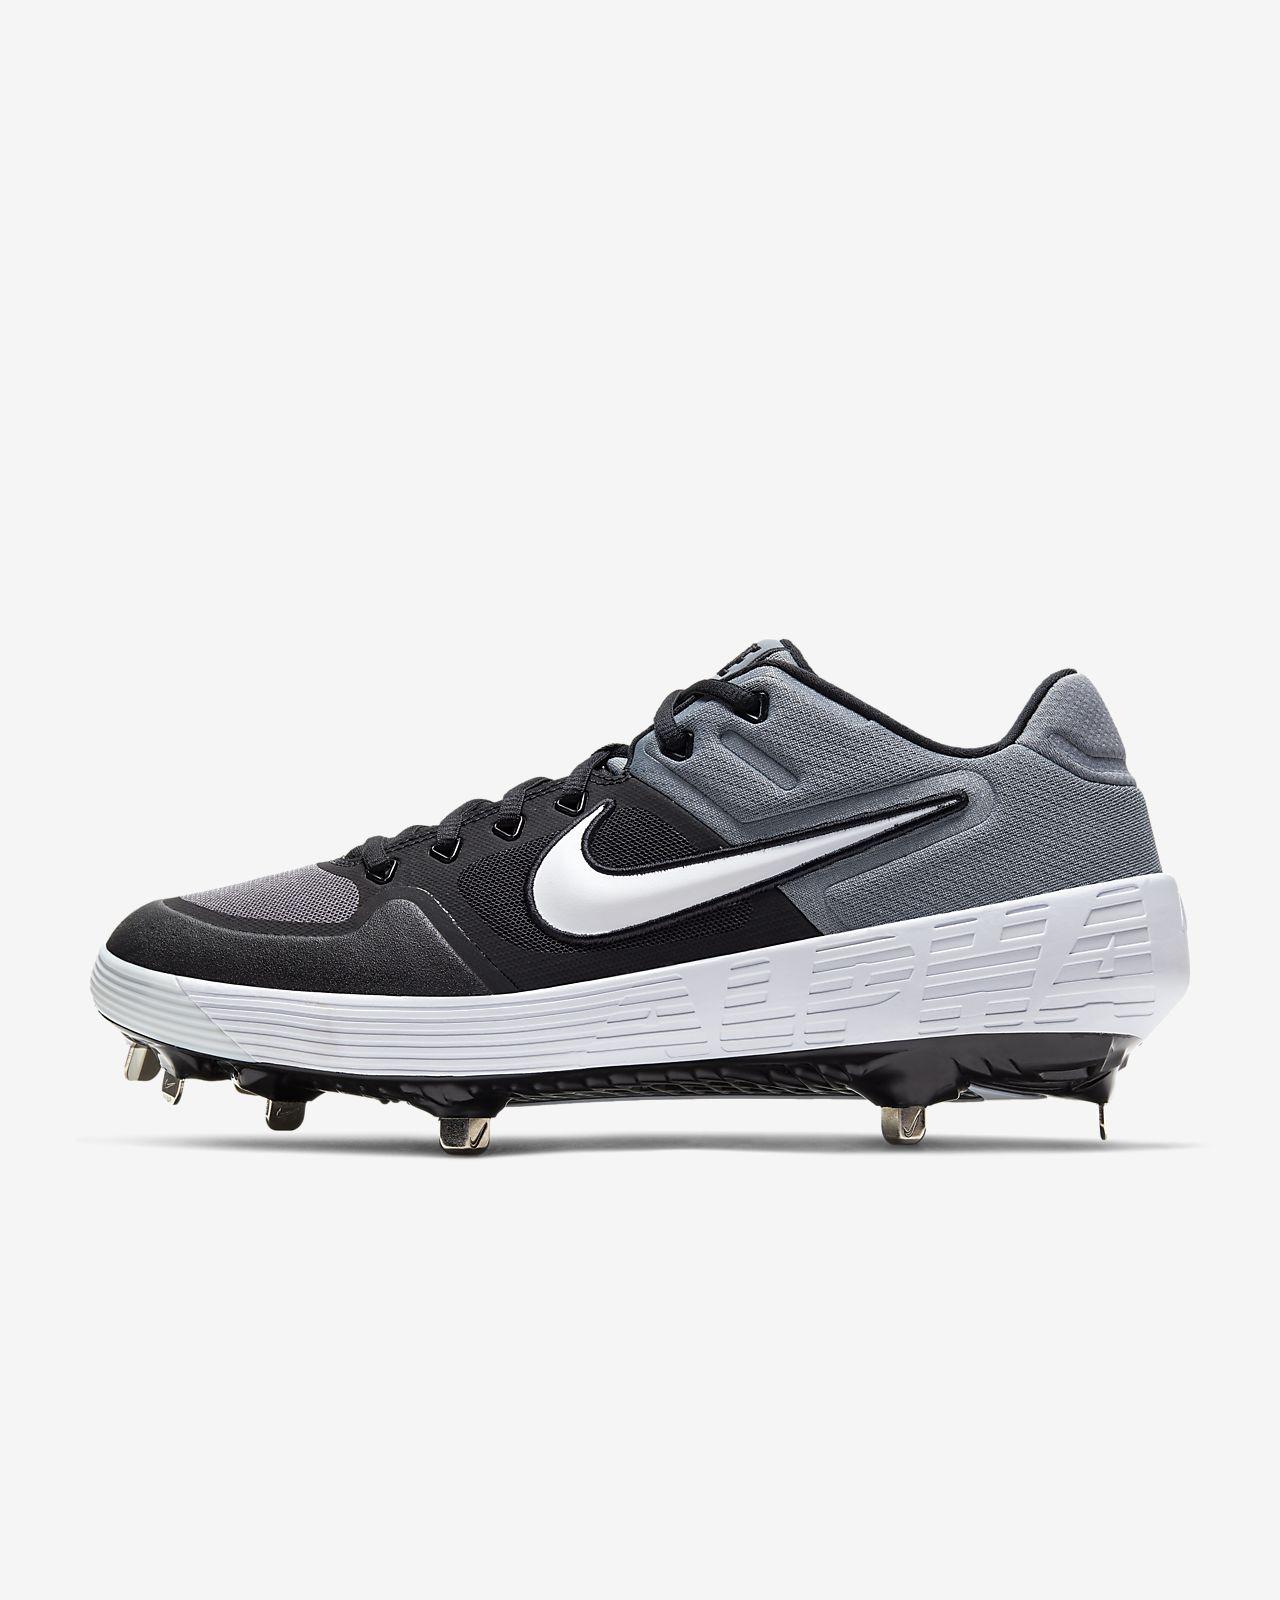 Nike Alpha Huarache Elite 2 Low Baseball Cleat